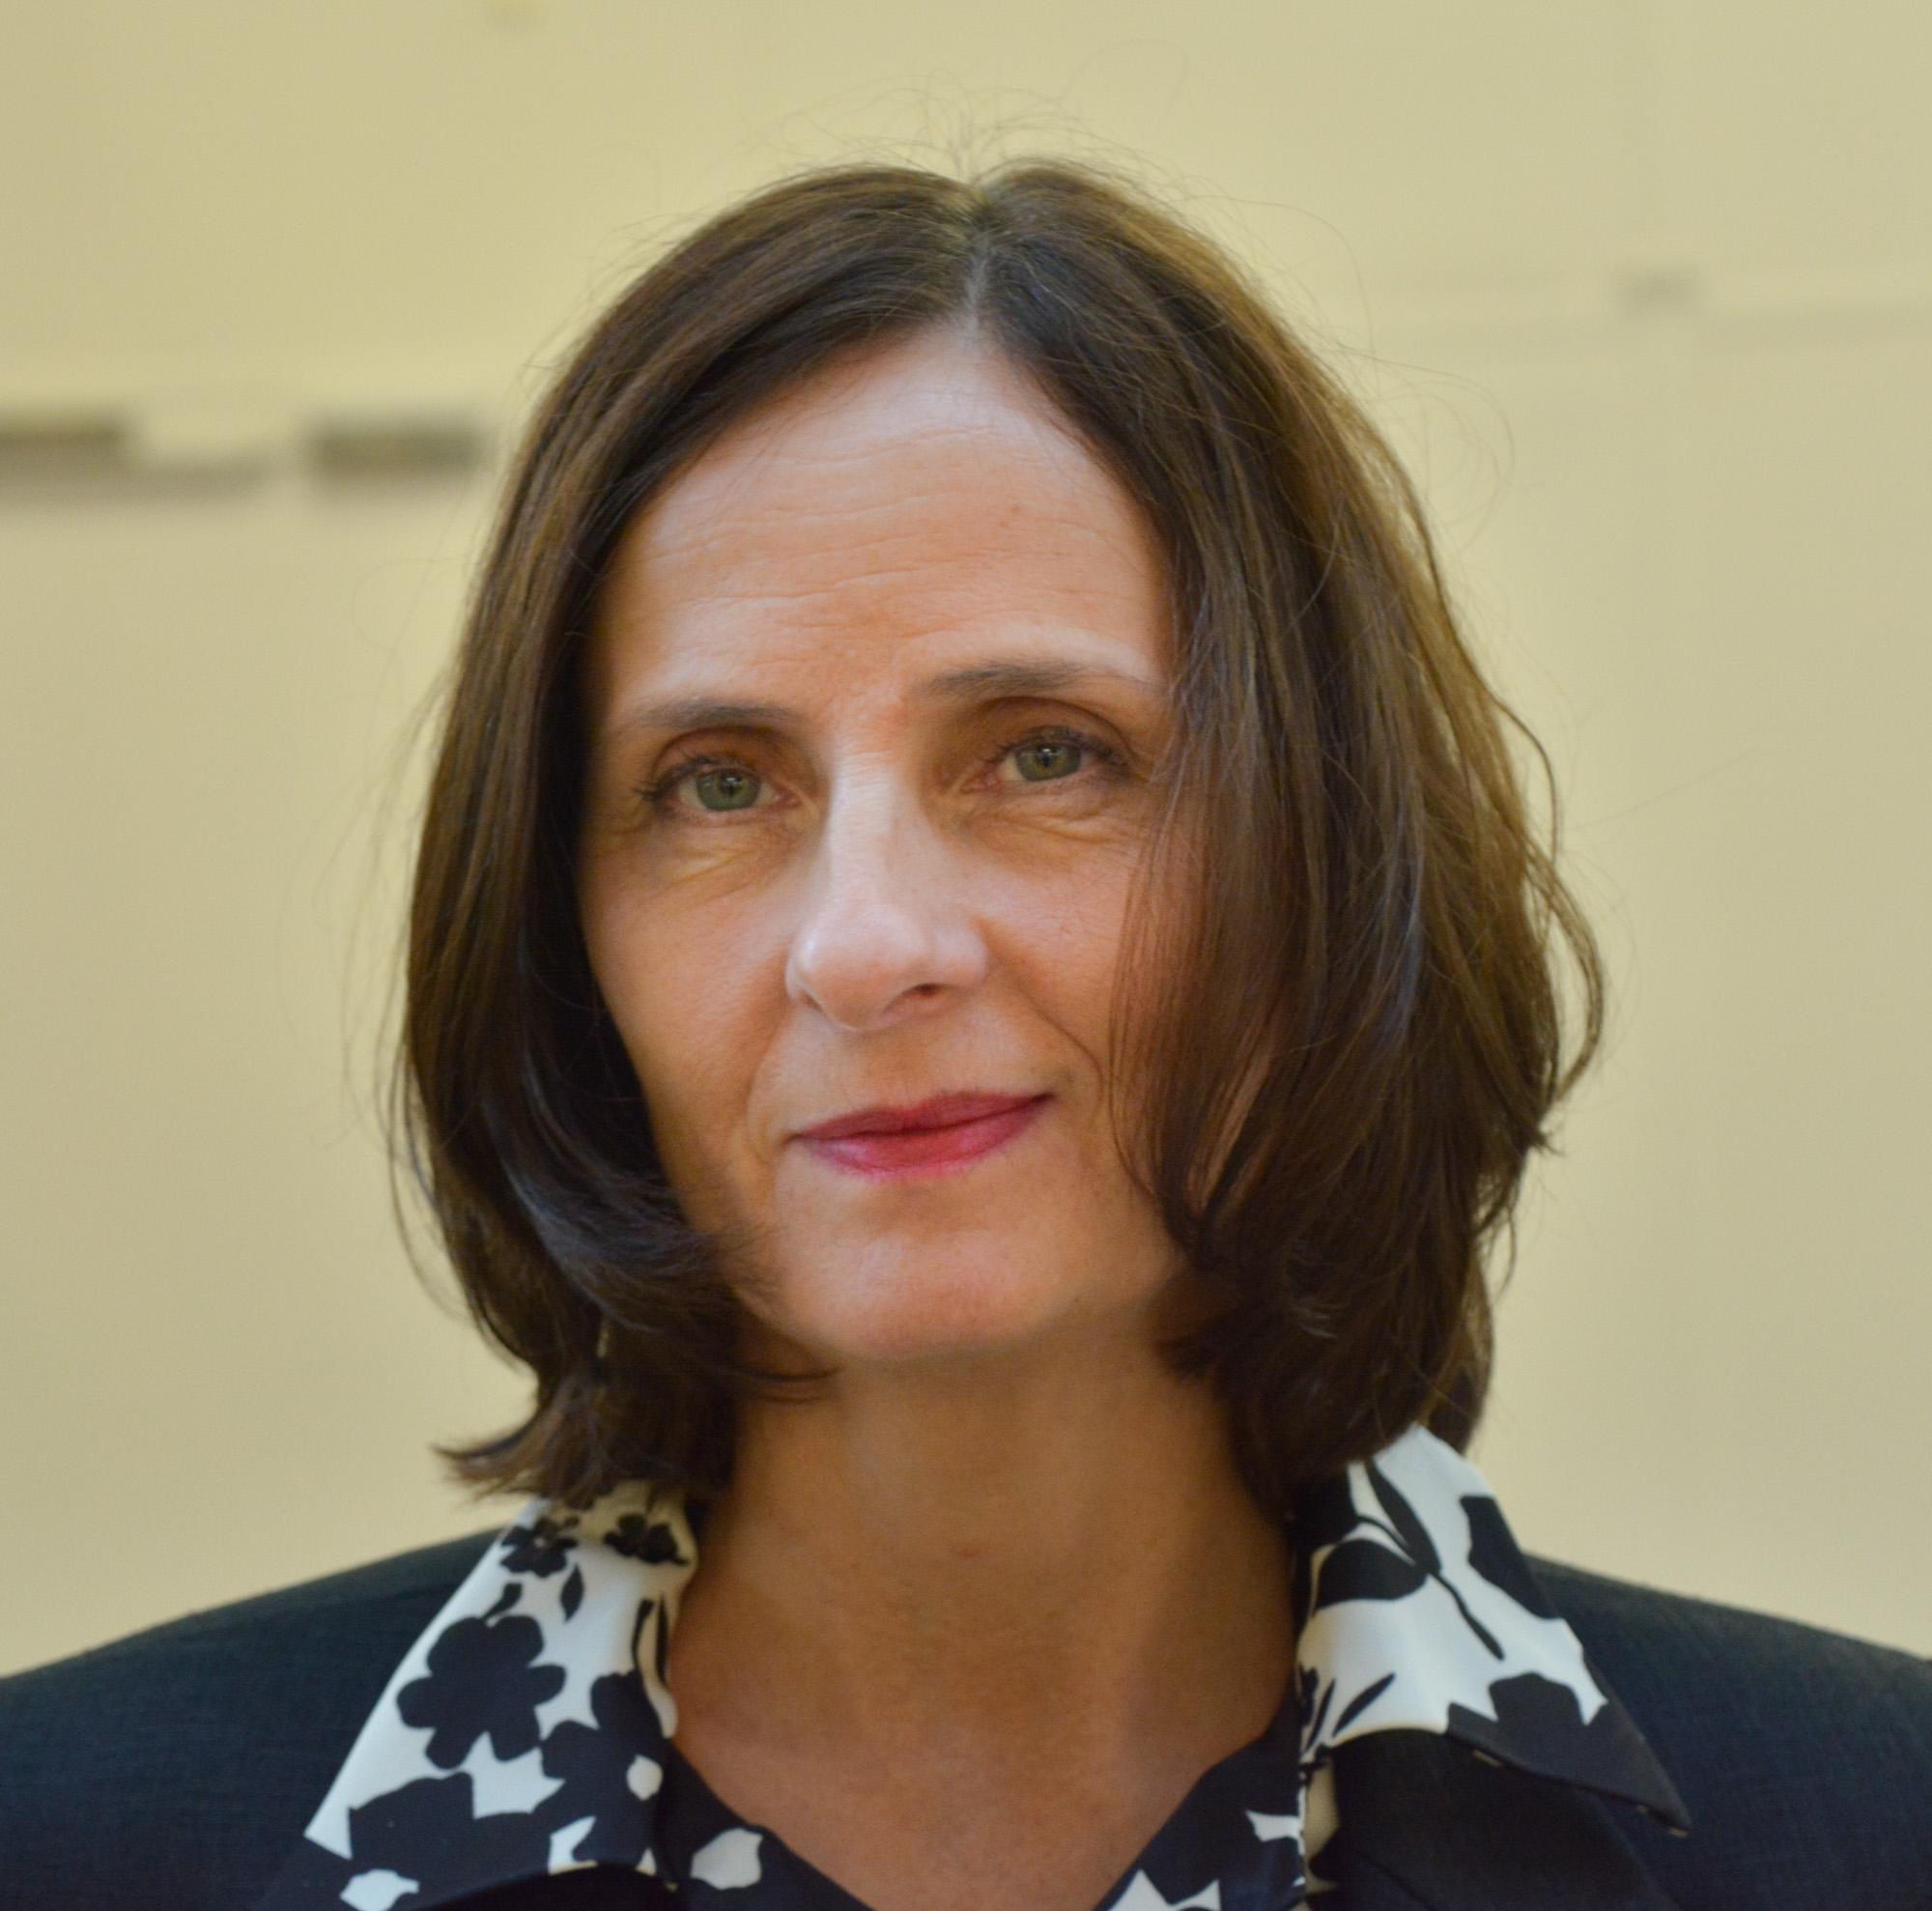 Susanna Alakoski – Wikipedia